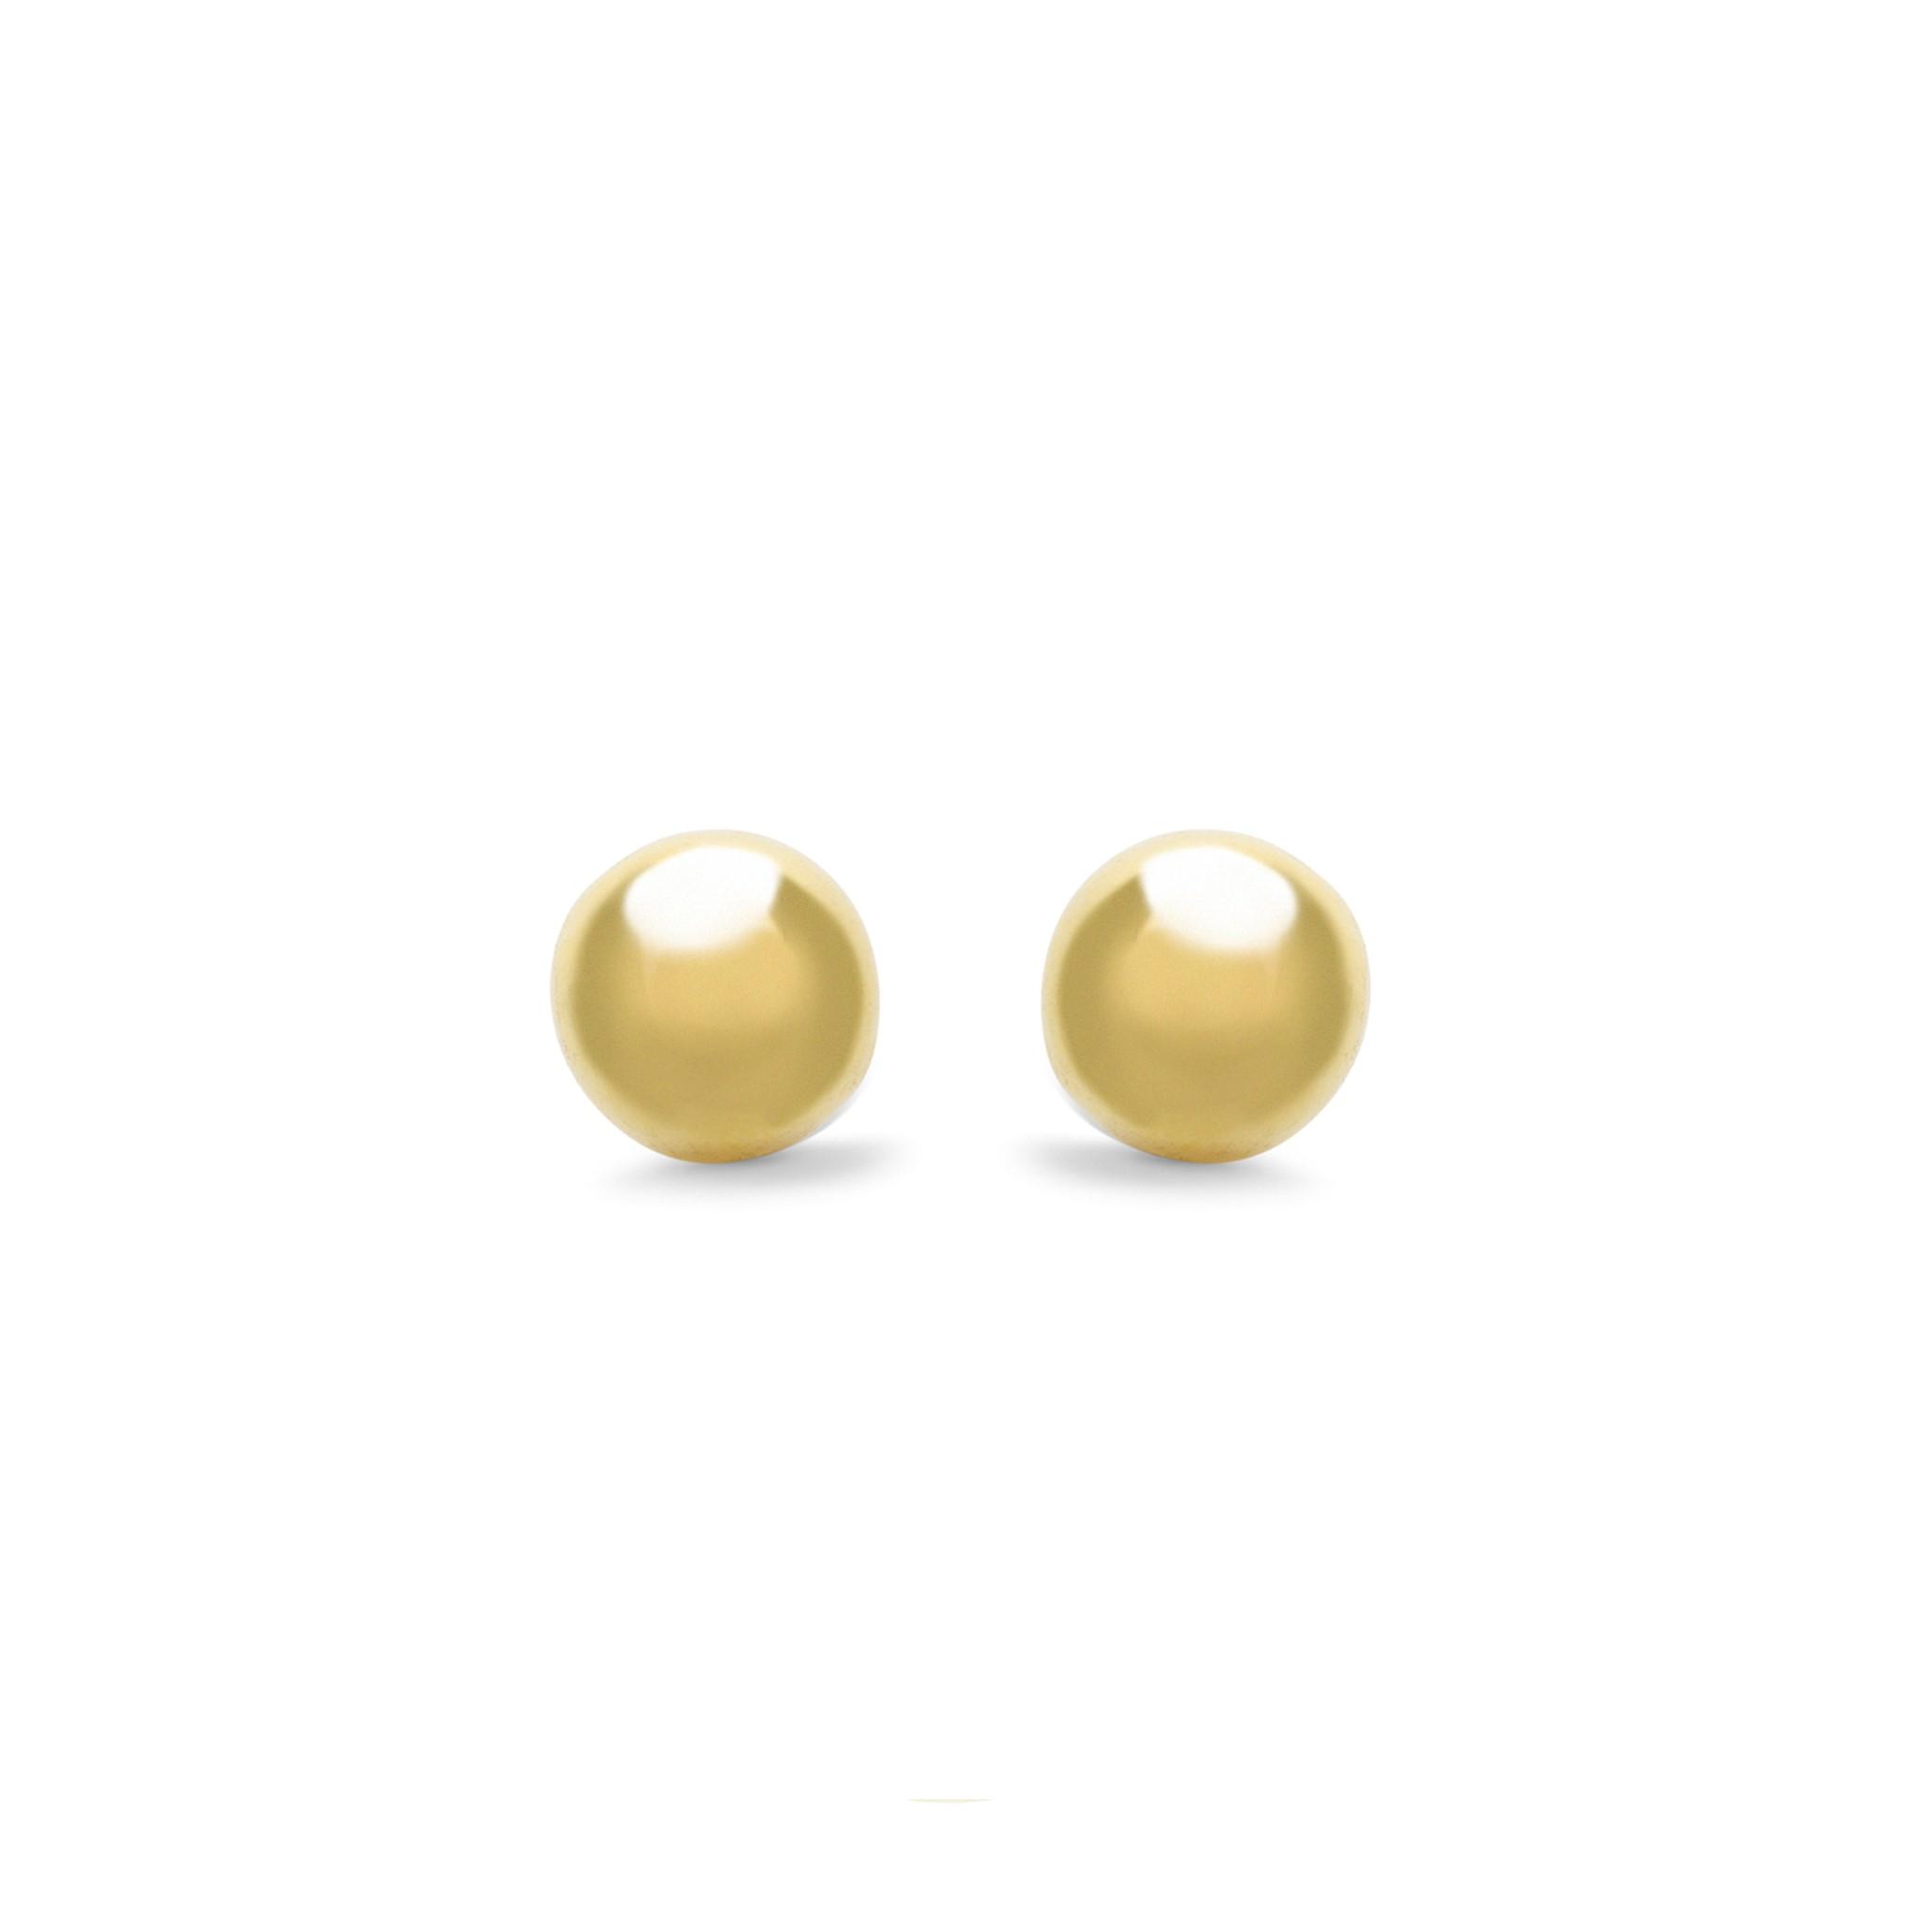 Ohrstecker Gold 375/9 ct